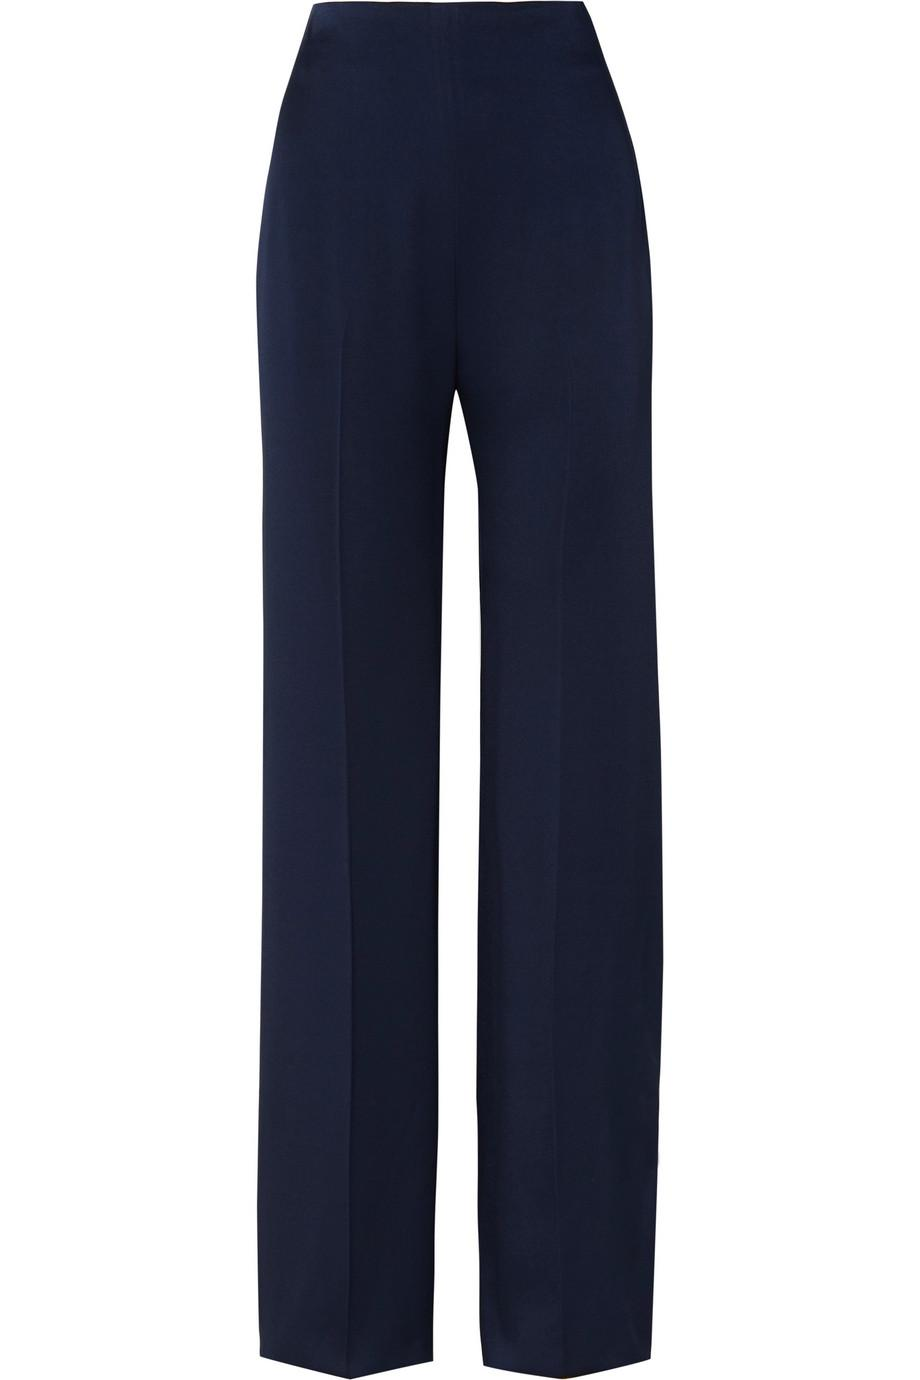 Satin Wide-leg Pants - Midnight blue Jenny Packham Best Sale Sale Online Sale Nicekicks Cheap Sale Buy New And Fashion Discount Inexpensive v3UkcEYJD